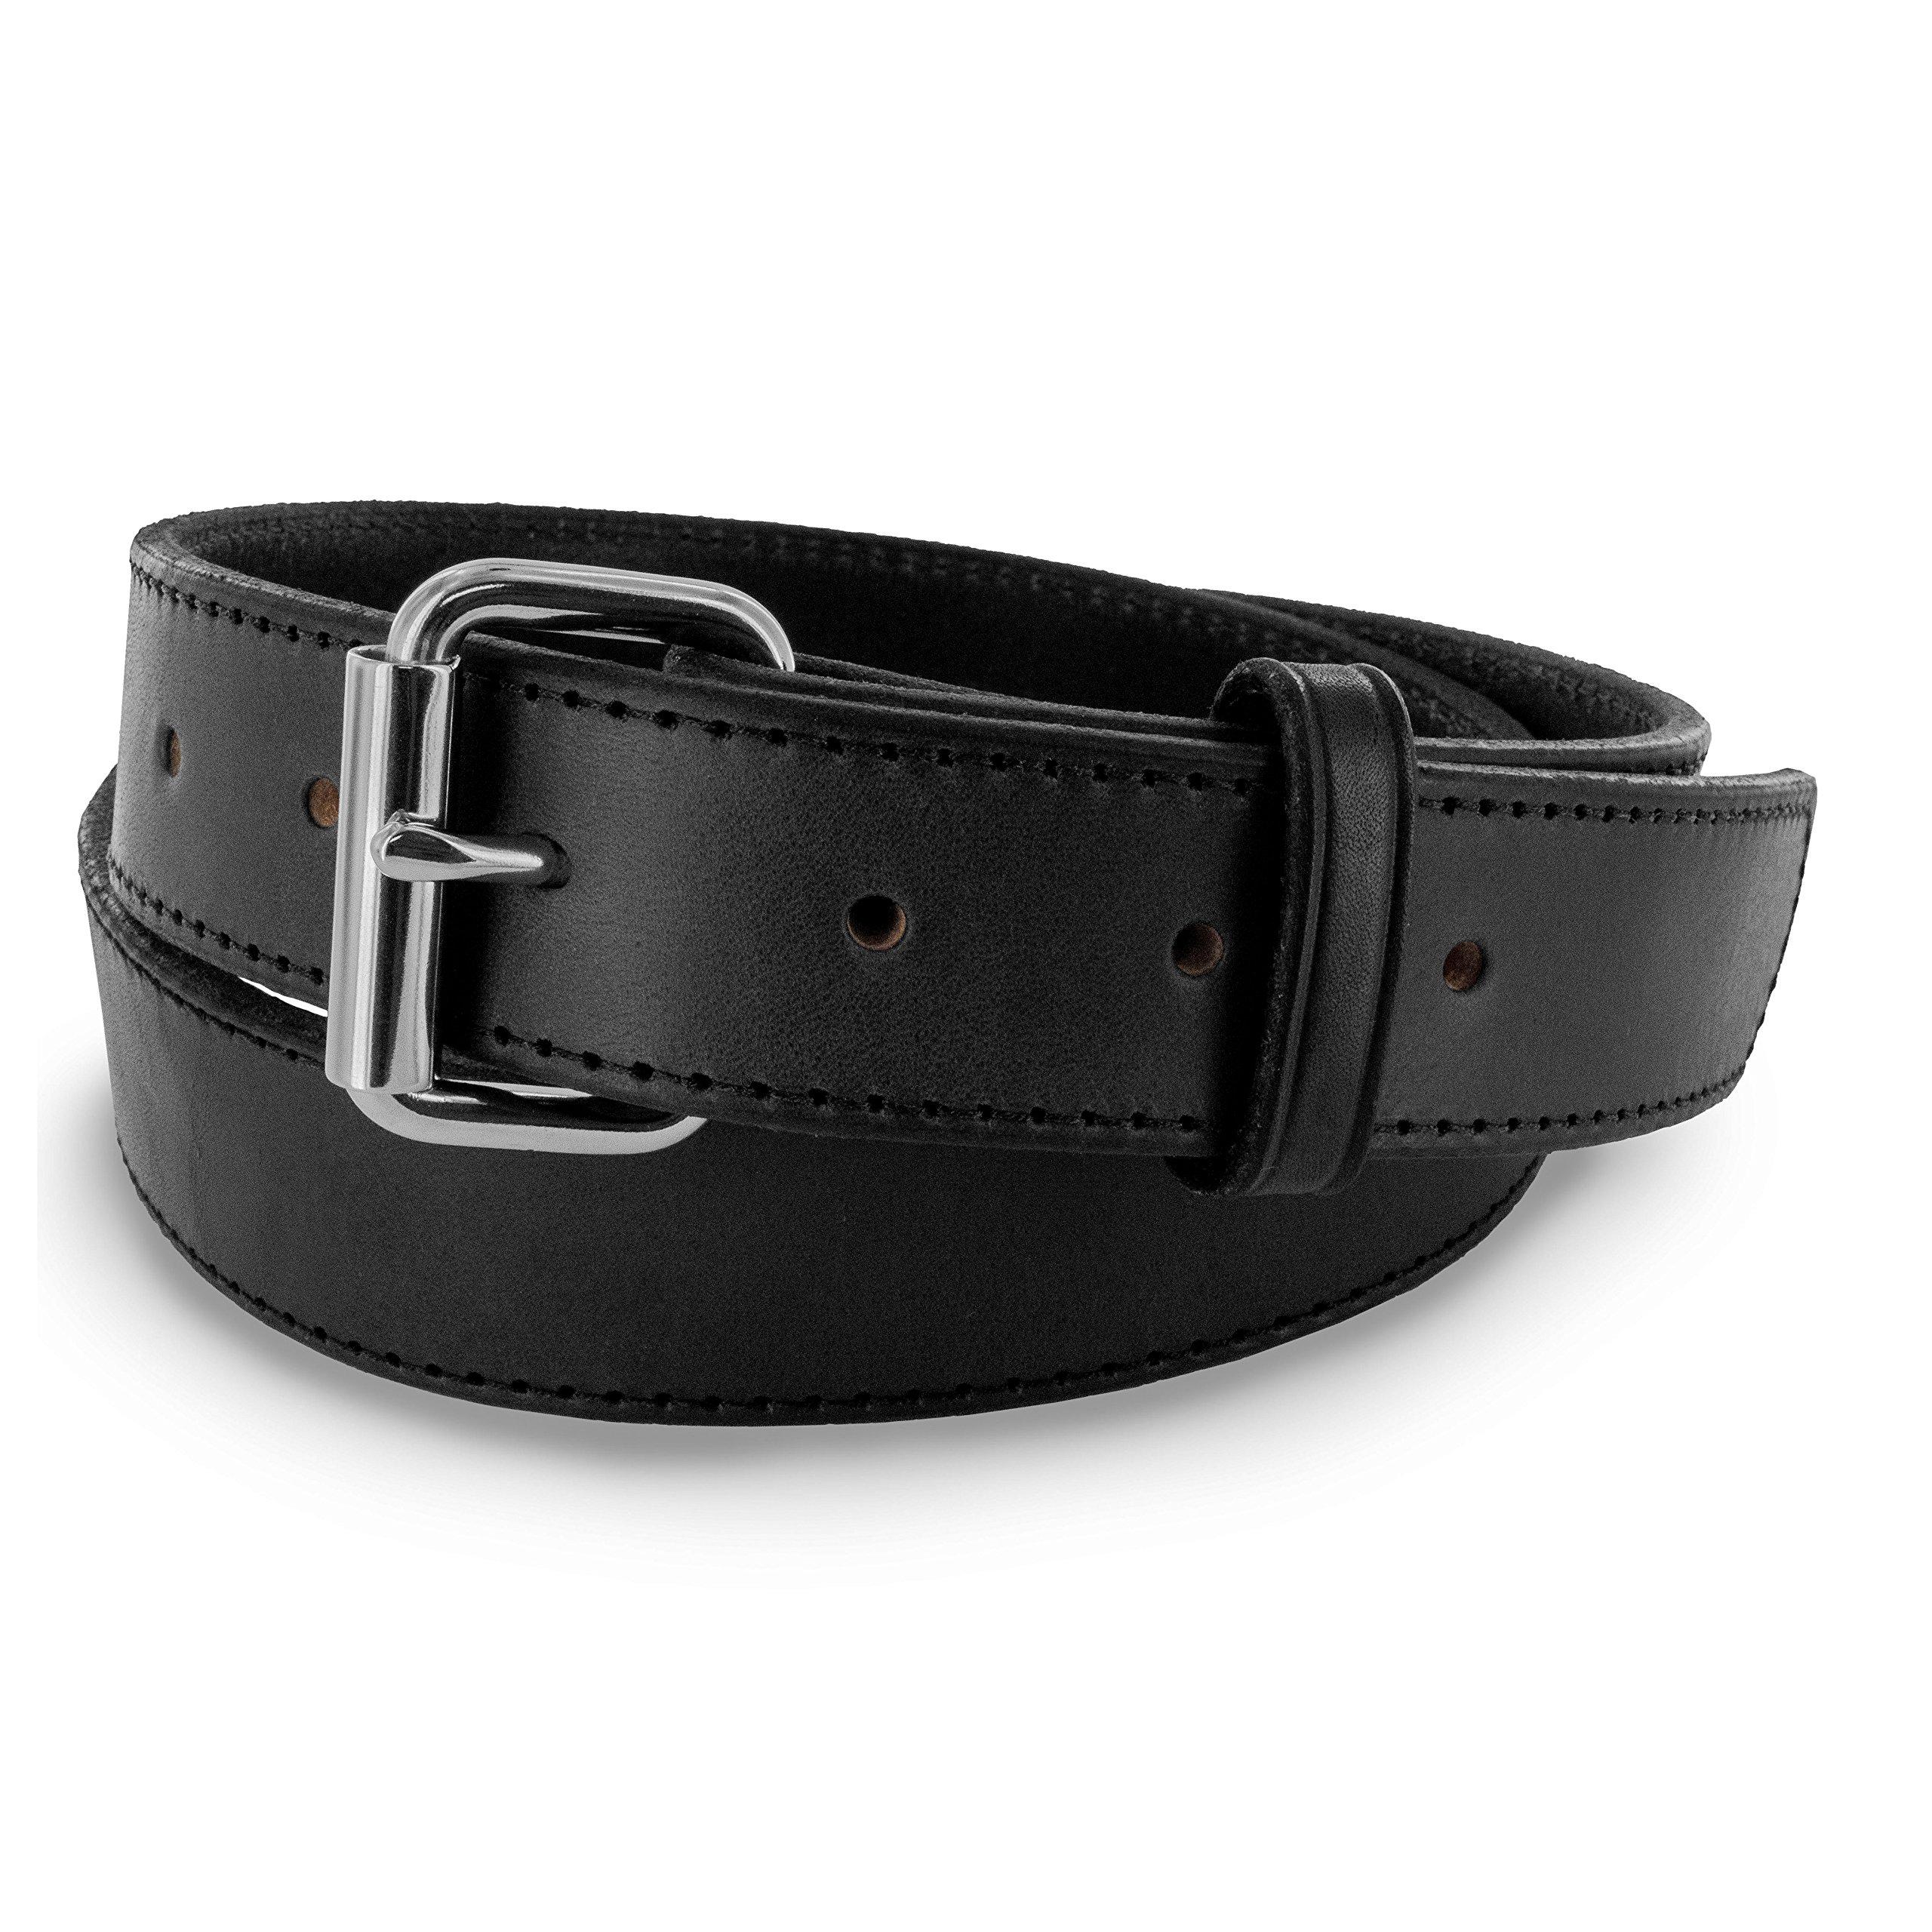 Hanks Stitch Gunner Belts - 1.5'' Best Vaue in A Concealed Carry Belt - USA Made 13OZ Leather - 100 Year Warranty - BLK - 32